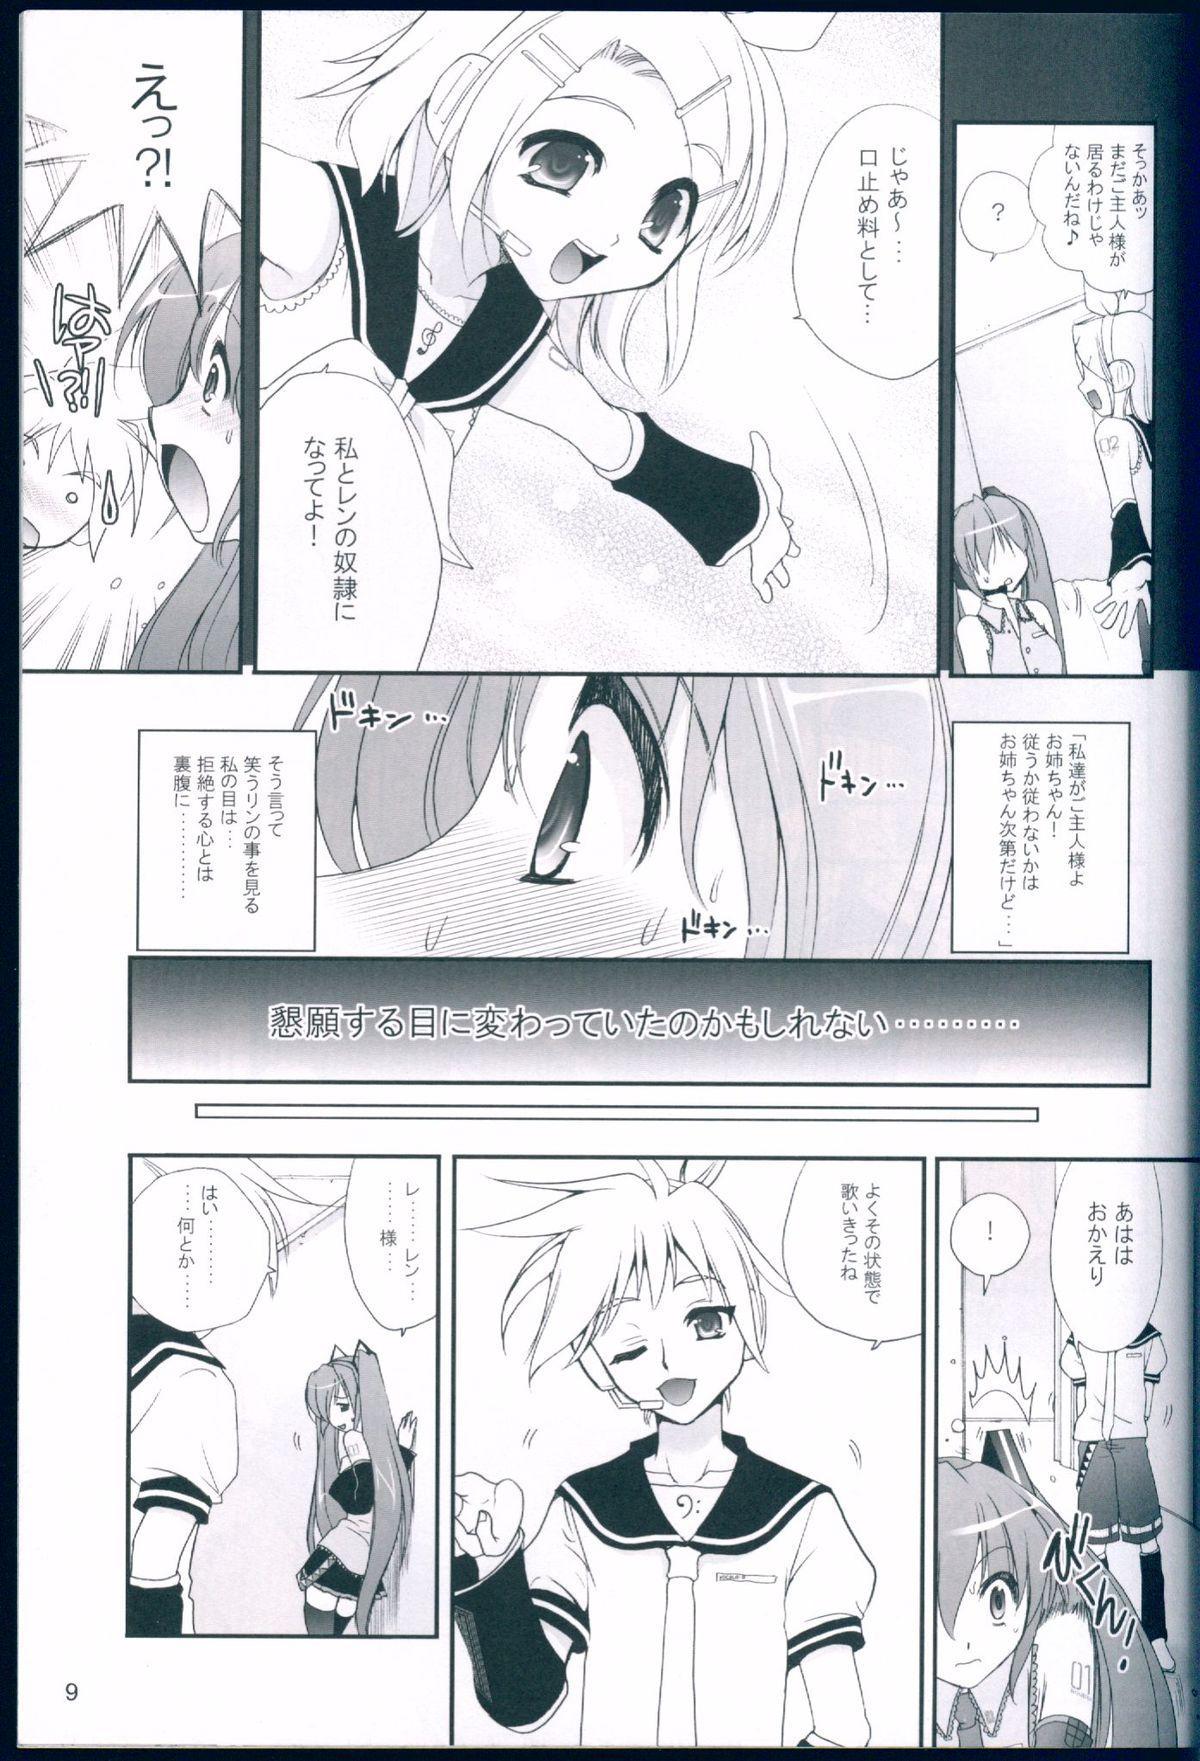 R Juu - Hatsune Miku Kenkan 8